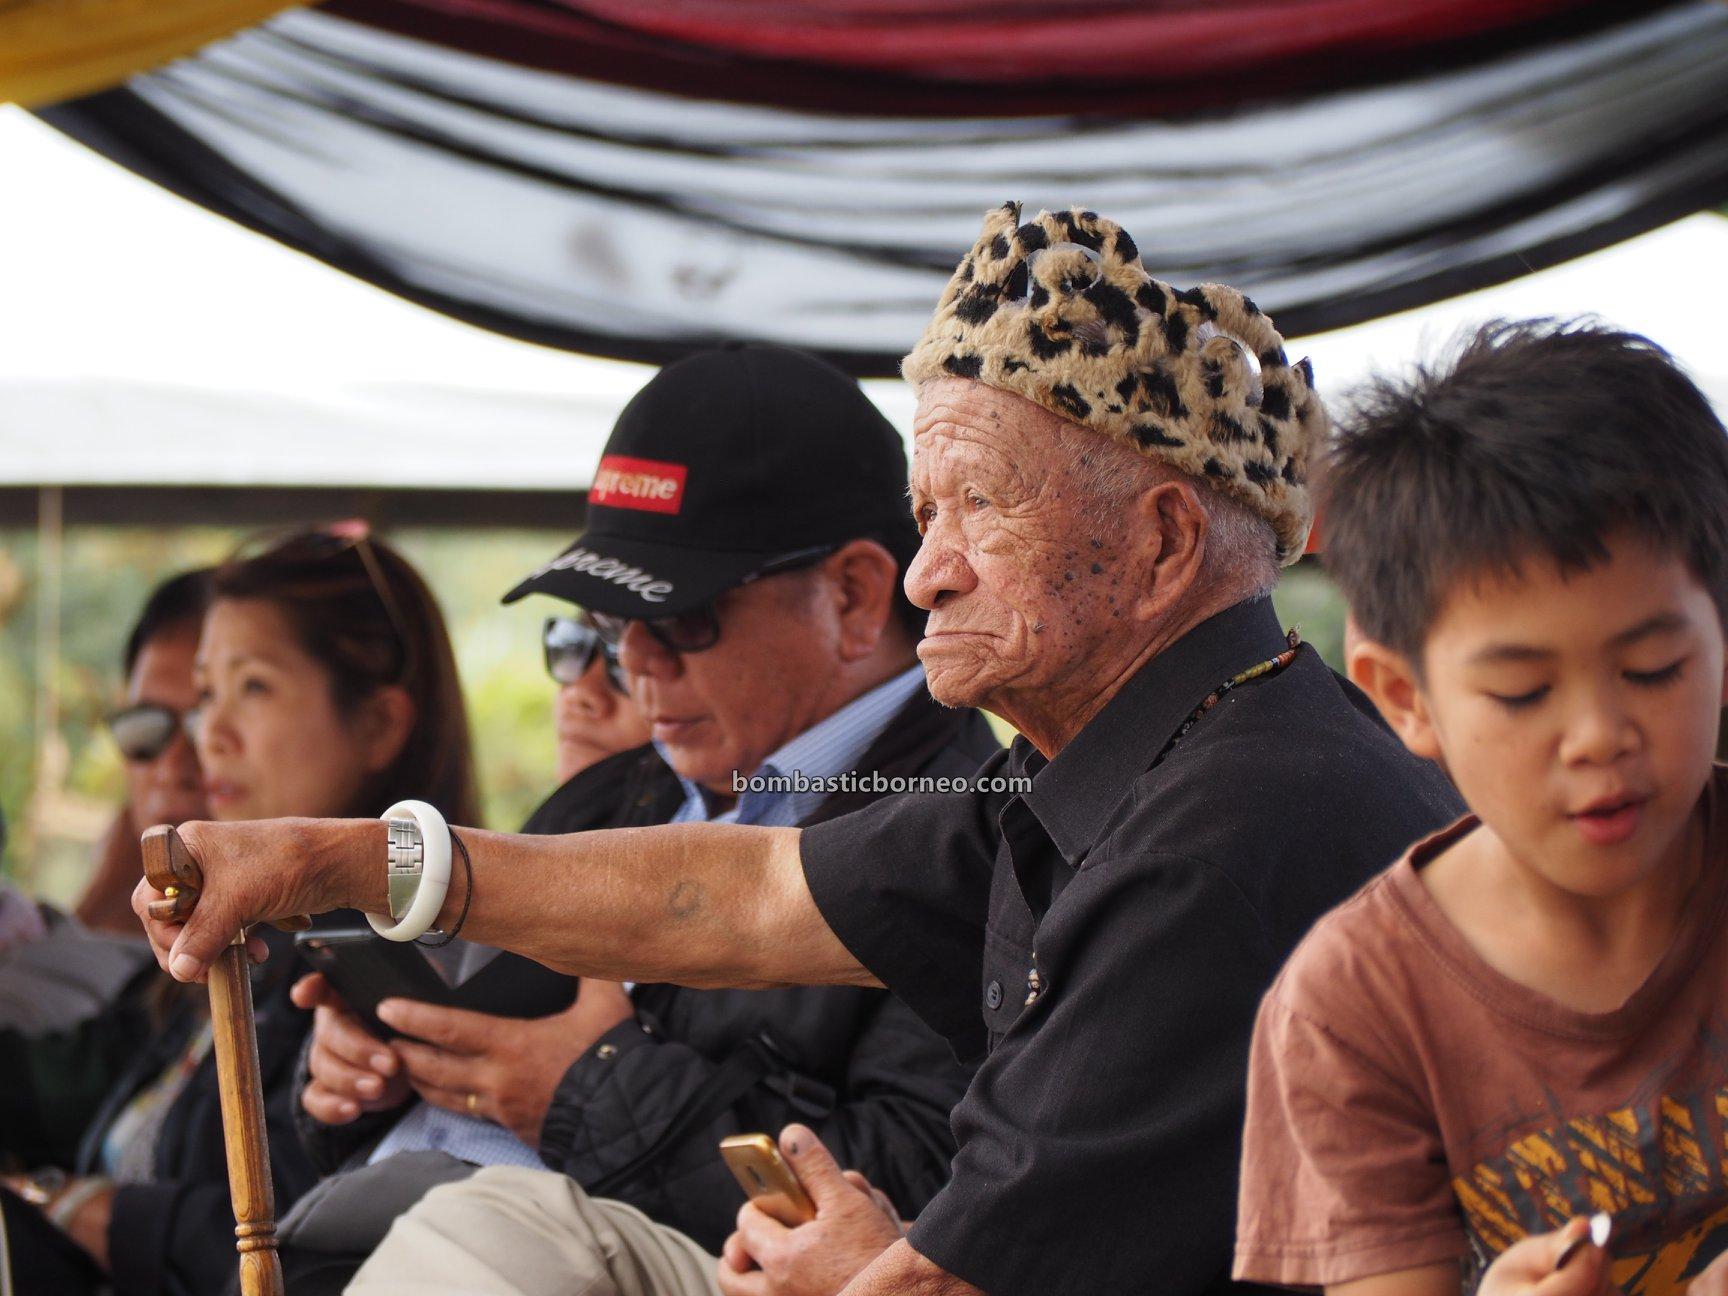 Pesta Nukenen, Bario Food Culture Festival. authentic, traditional, Tanah Tinggi Bario,event, malaysia, Ethnic, native, Orang Ulu, Tourism, travel guide, 砂拉越巴里奥高原, 达雅加拉毕族文化, 婆罗洲土著部落